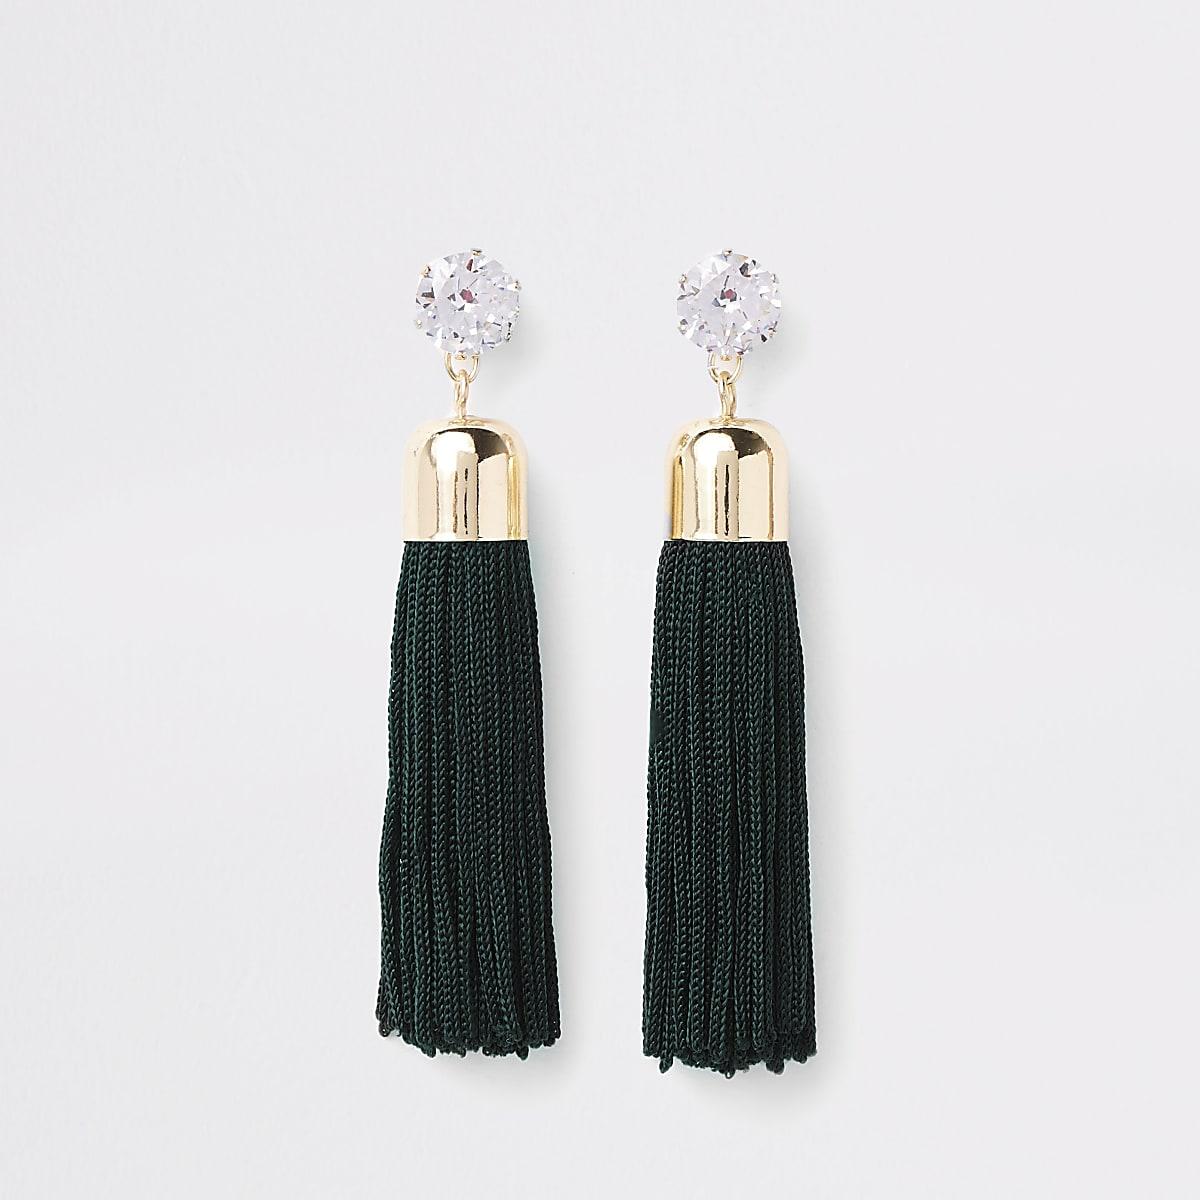 Gold tone green diamante tassel drop earrings